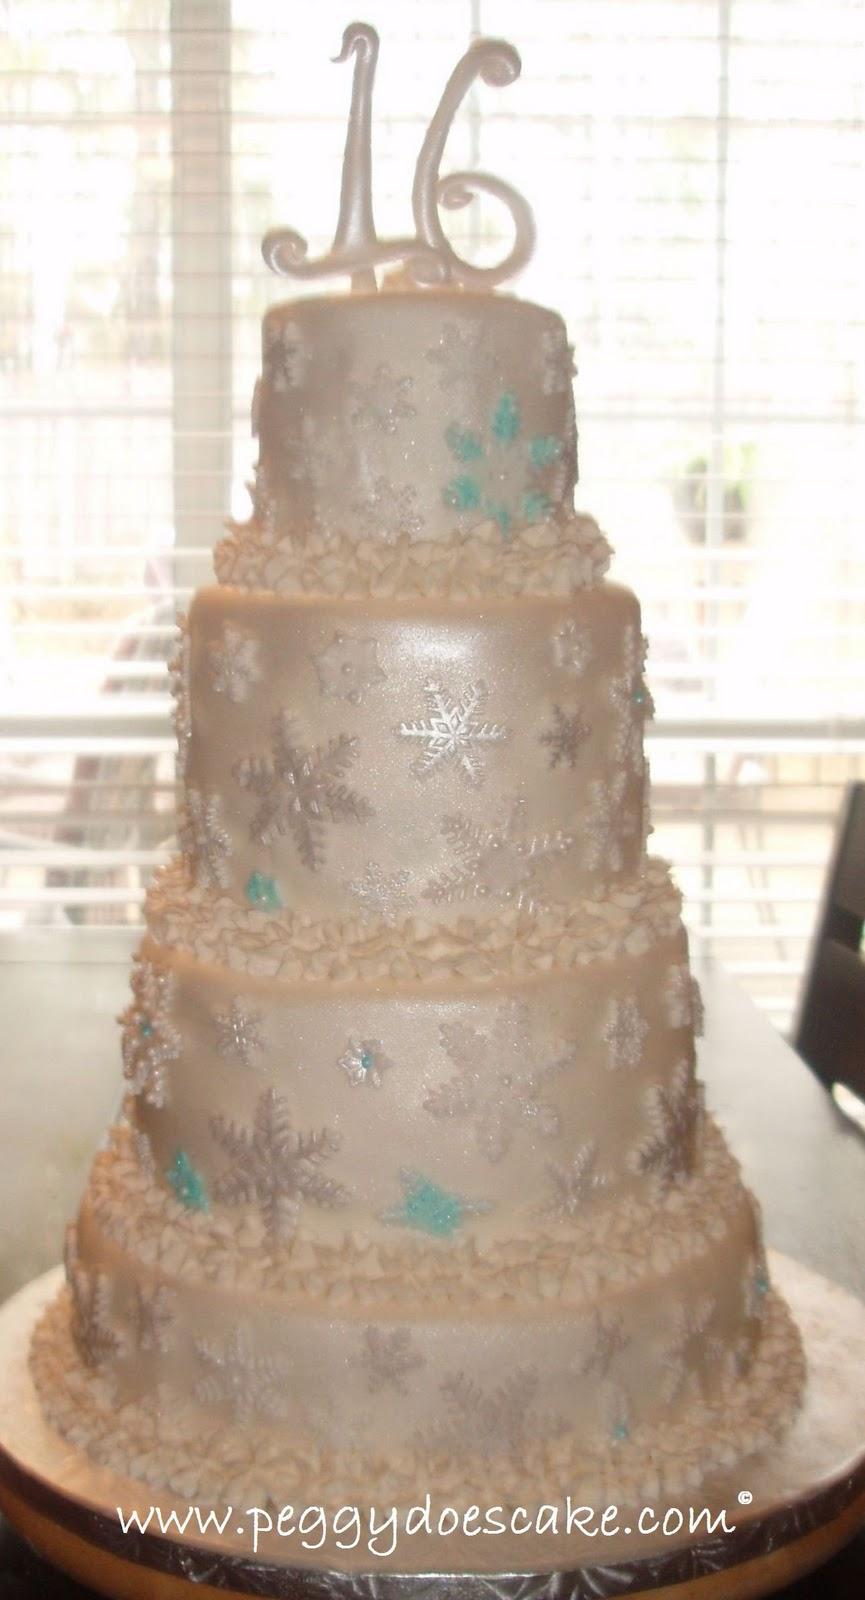 Peggy Does Cake Alyssas Winter Wonderland Sweet 16 Birthday